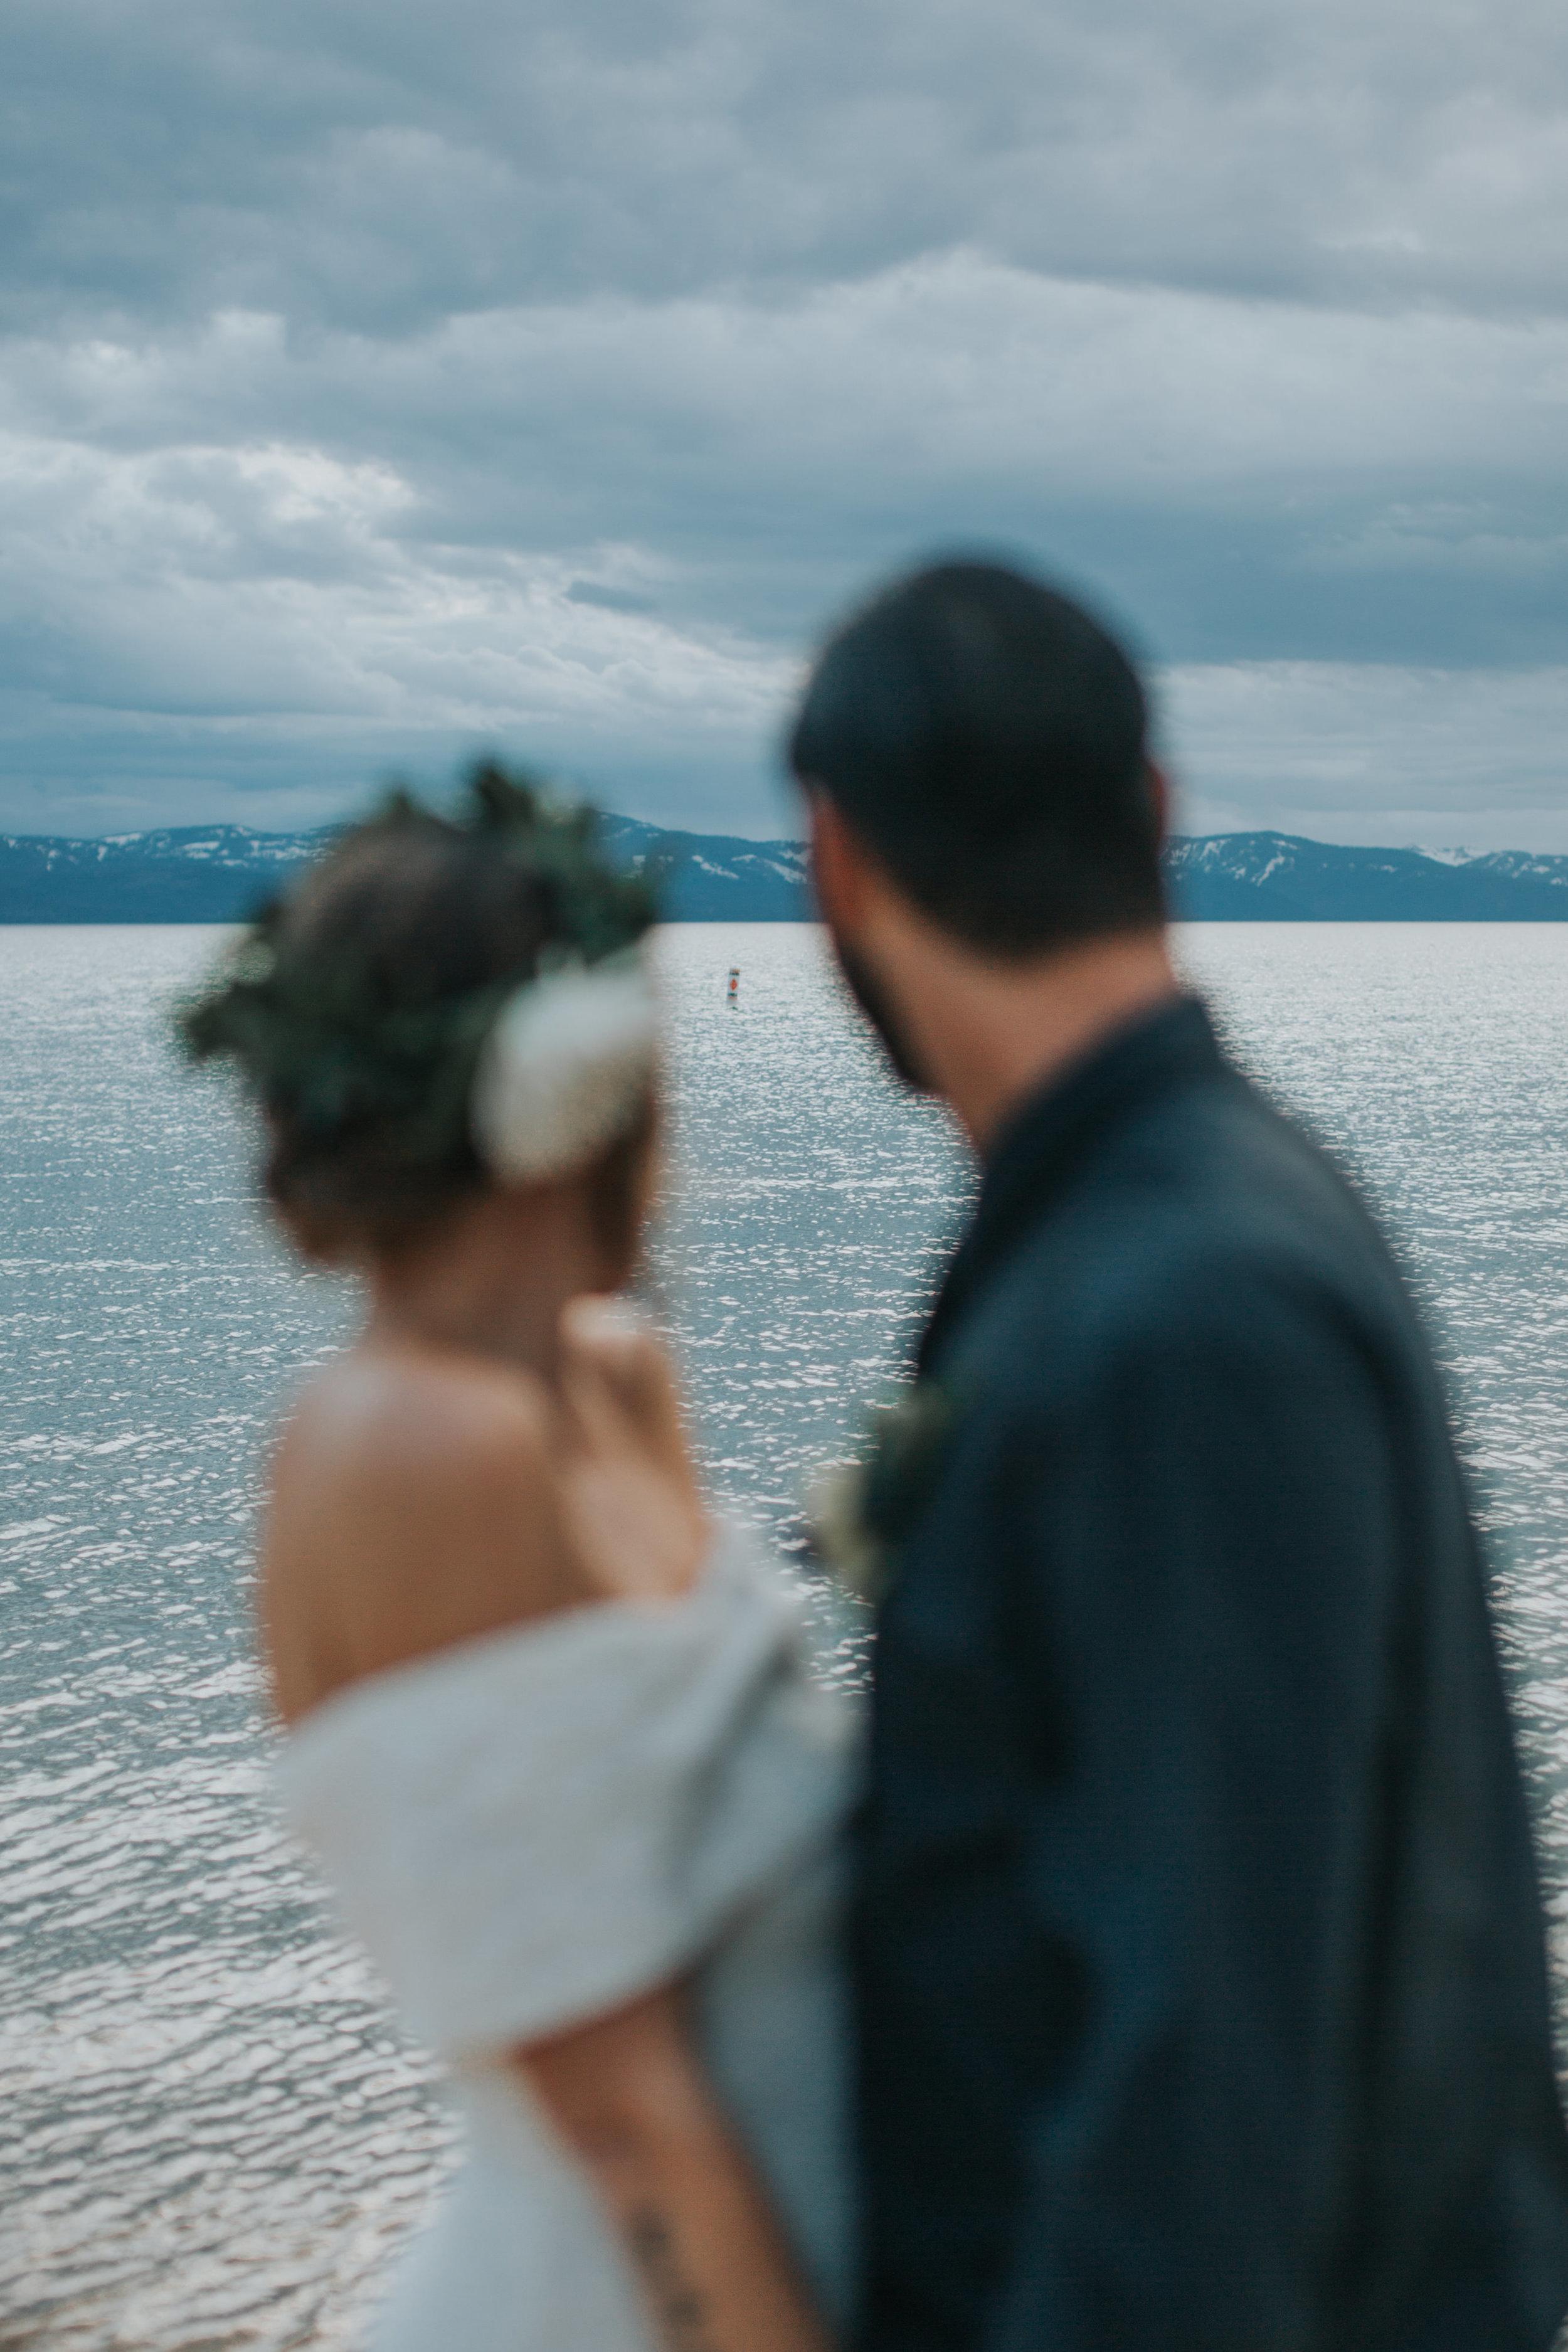 south-lake-tahoe-elopement-valerie-lendvay-photo-062.jpg